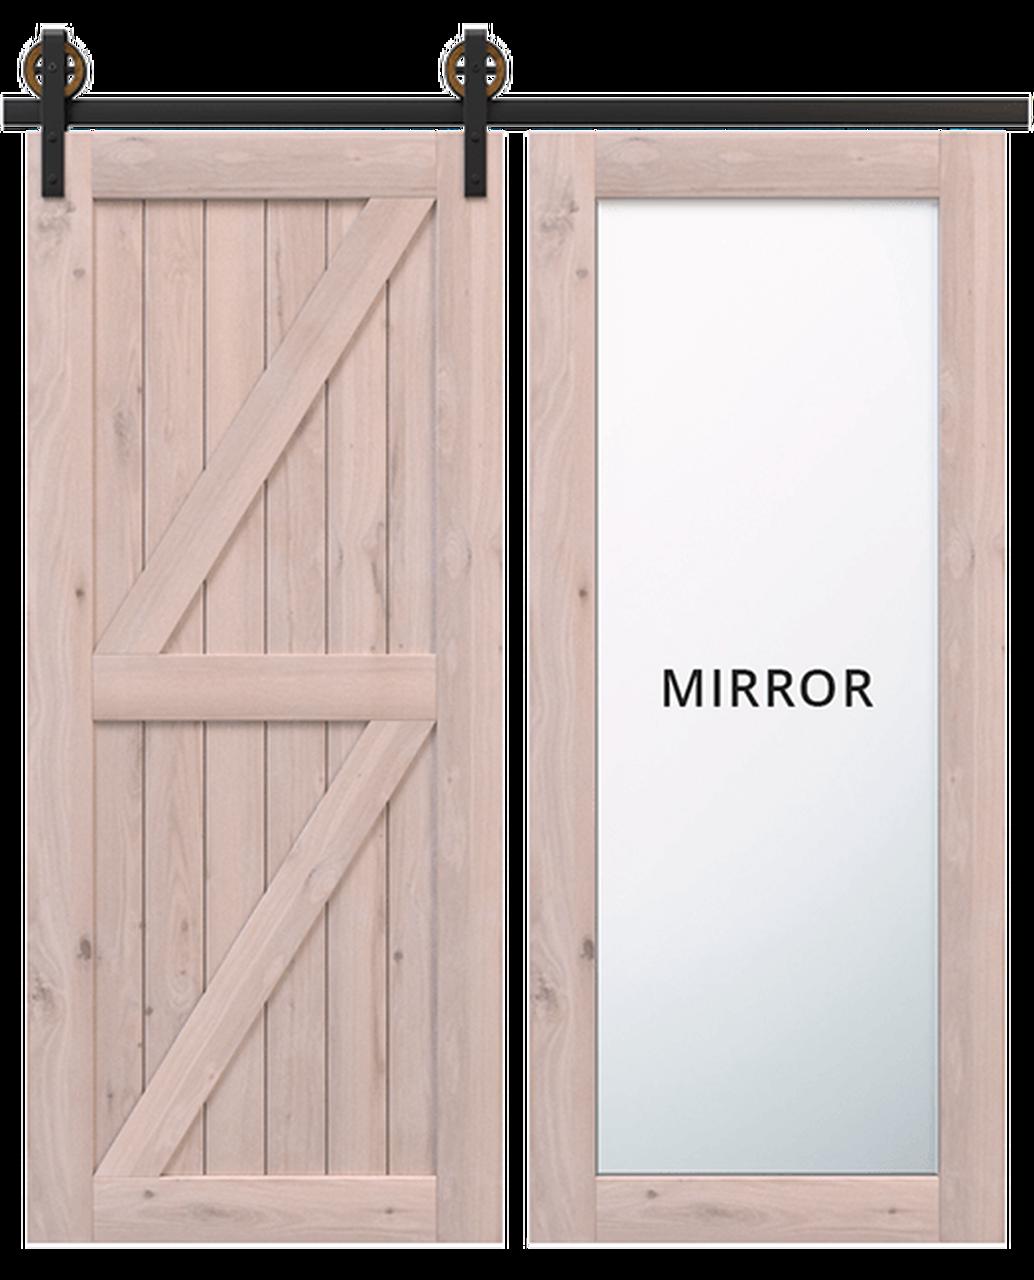 stowe wood full mirror panel unfinished wood double z panel barn door